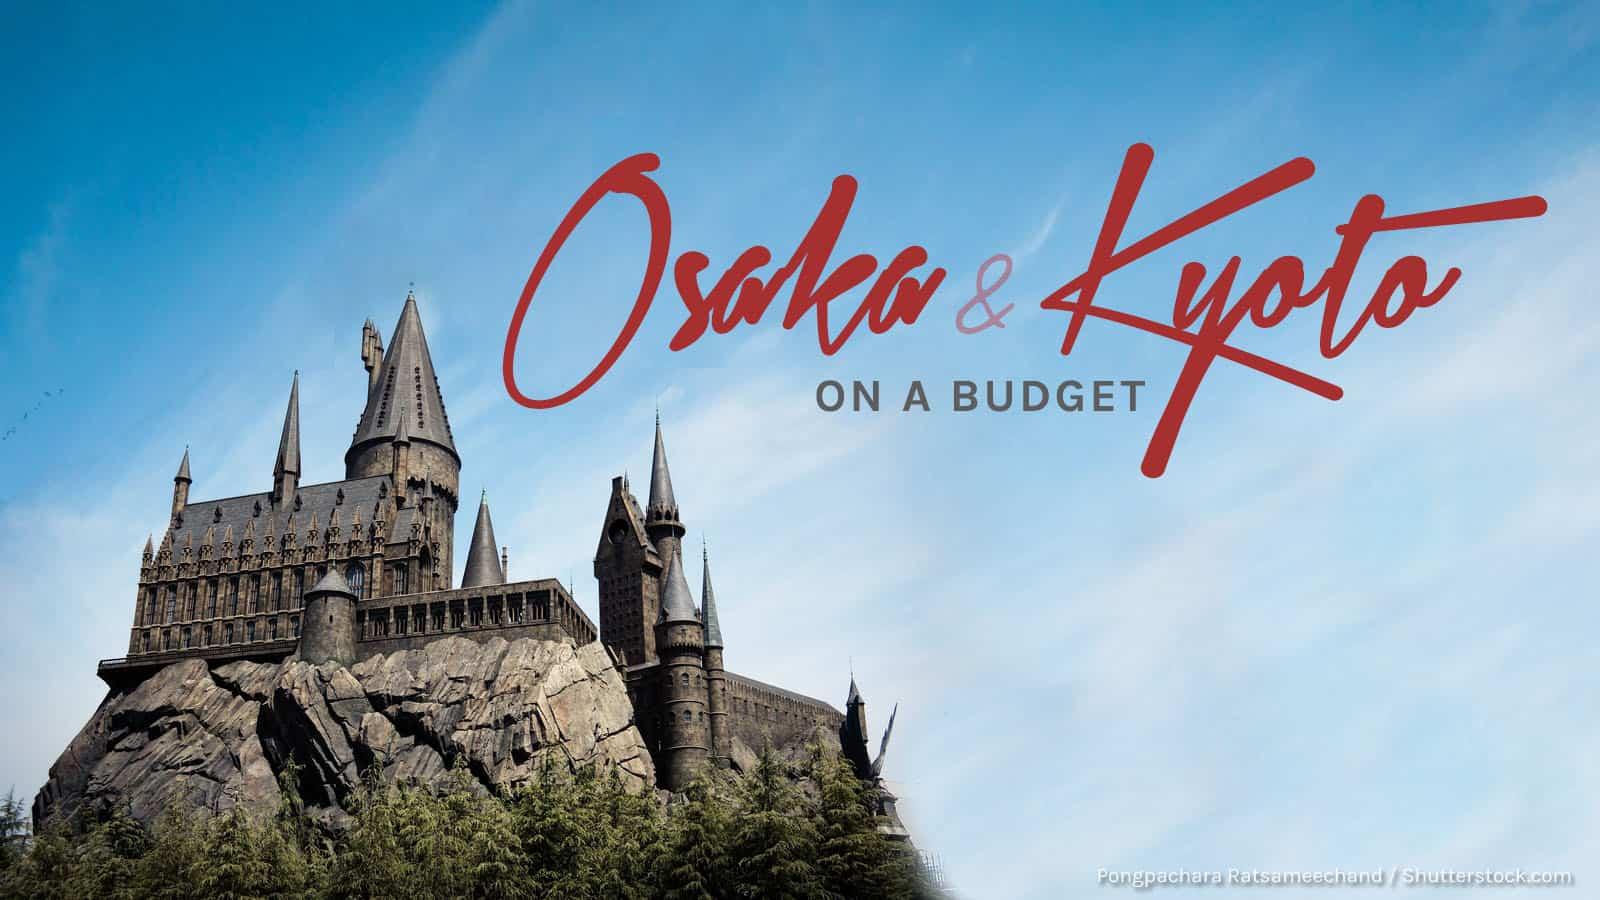 OSAKA AND KYOTO: Budget Travel Guide